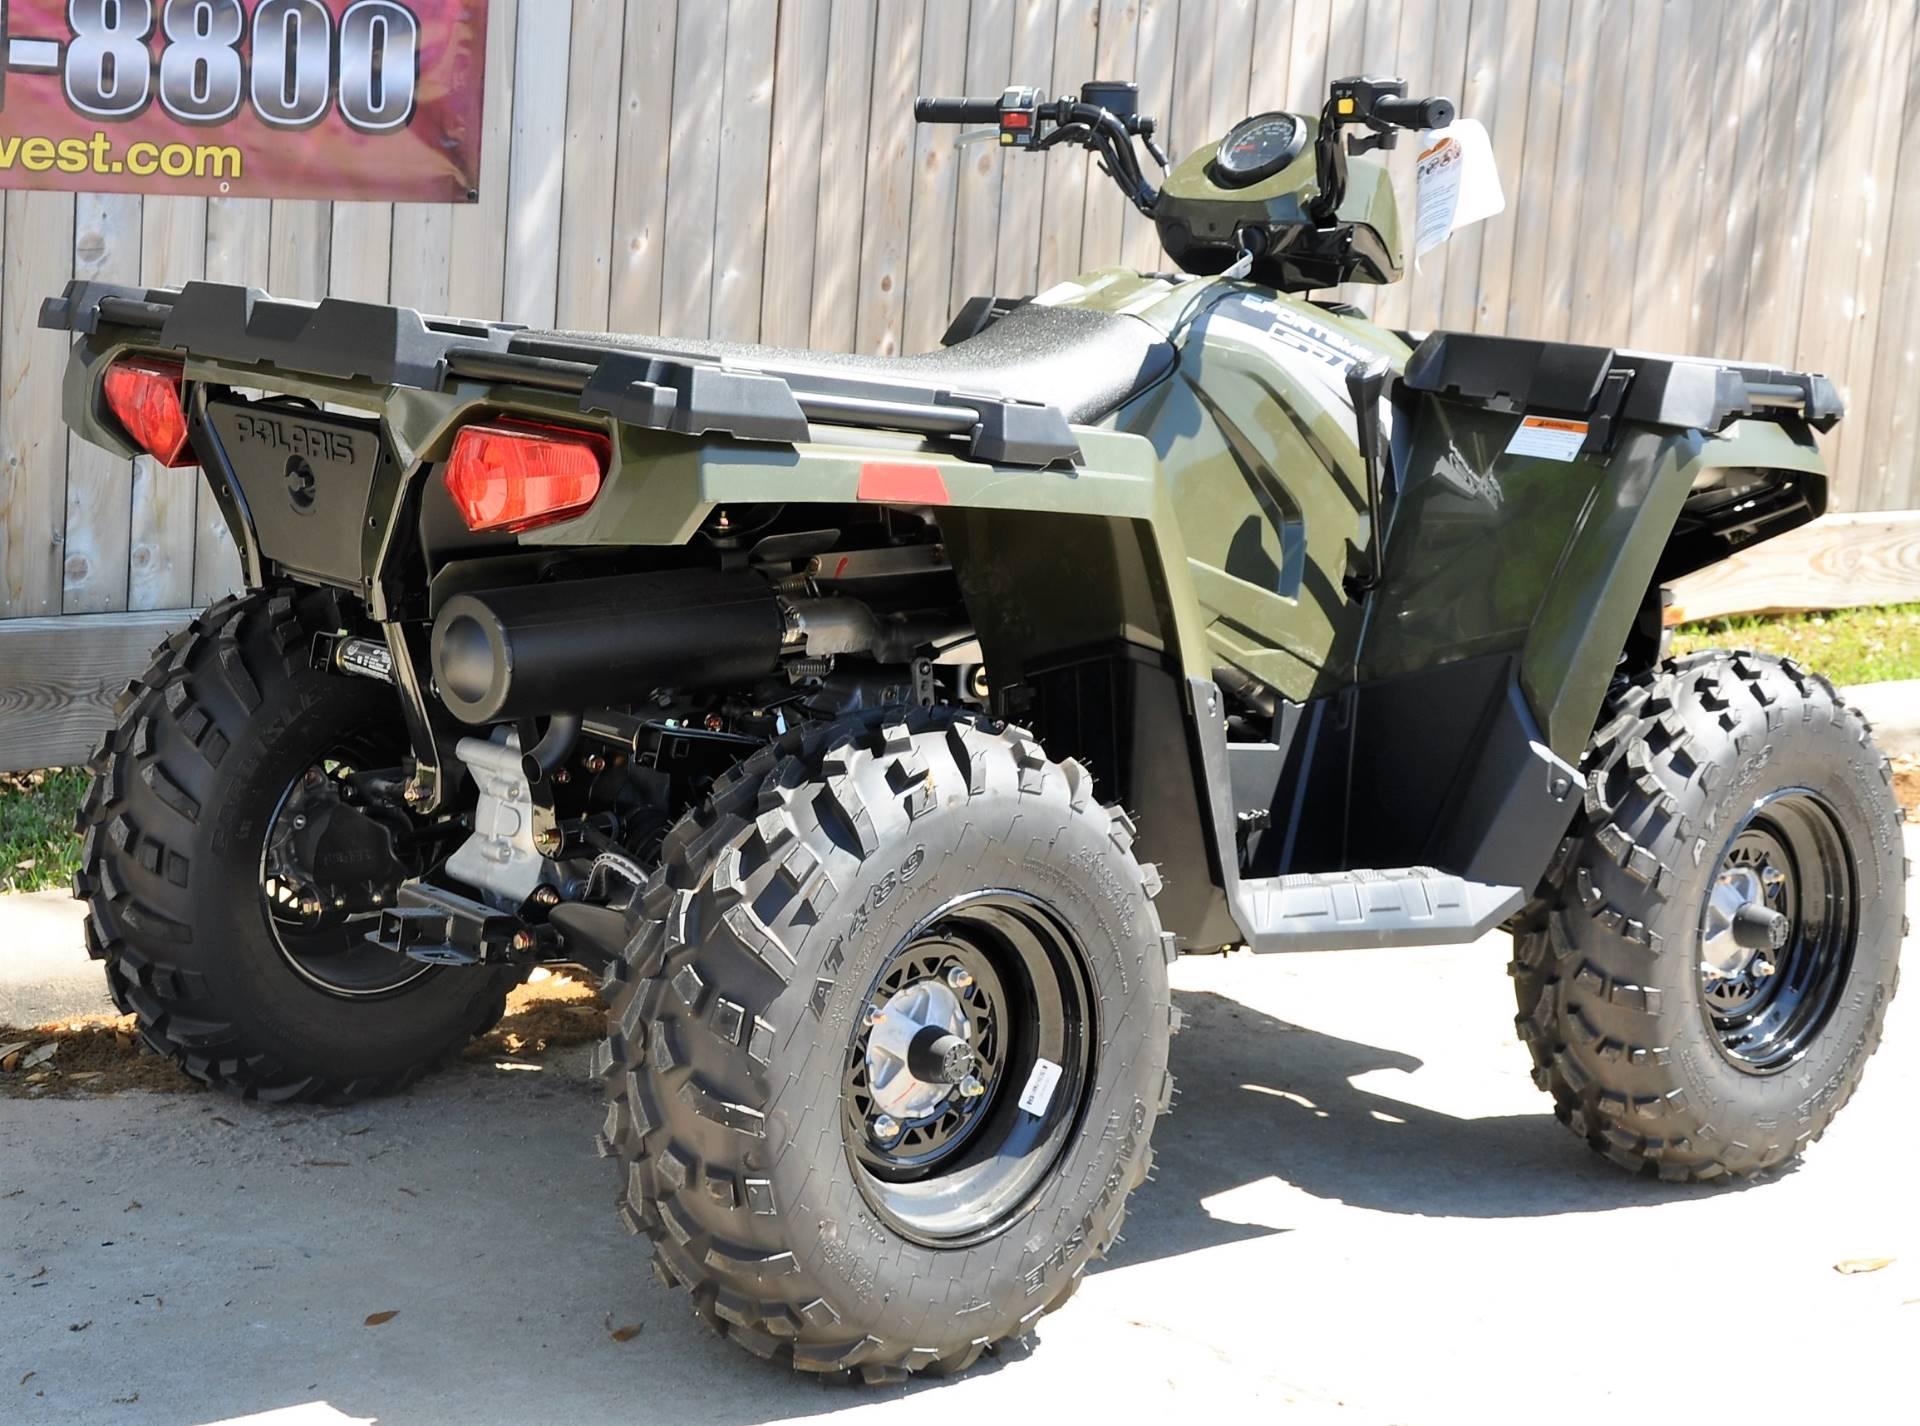 New 2018 Polaris Sportsman 570 ATVs in Katy, TX | Stock Number ...